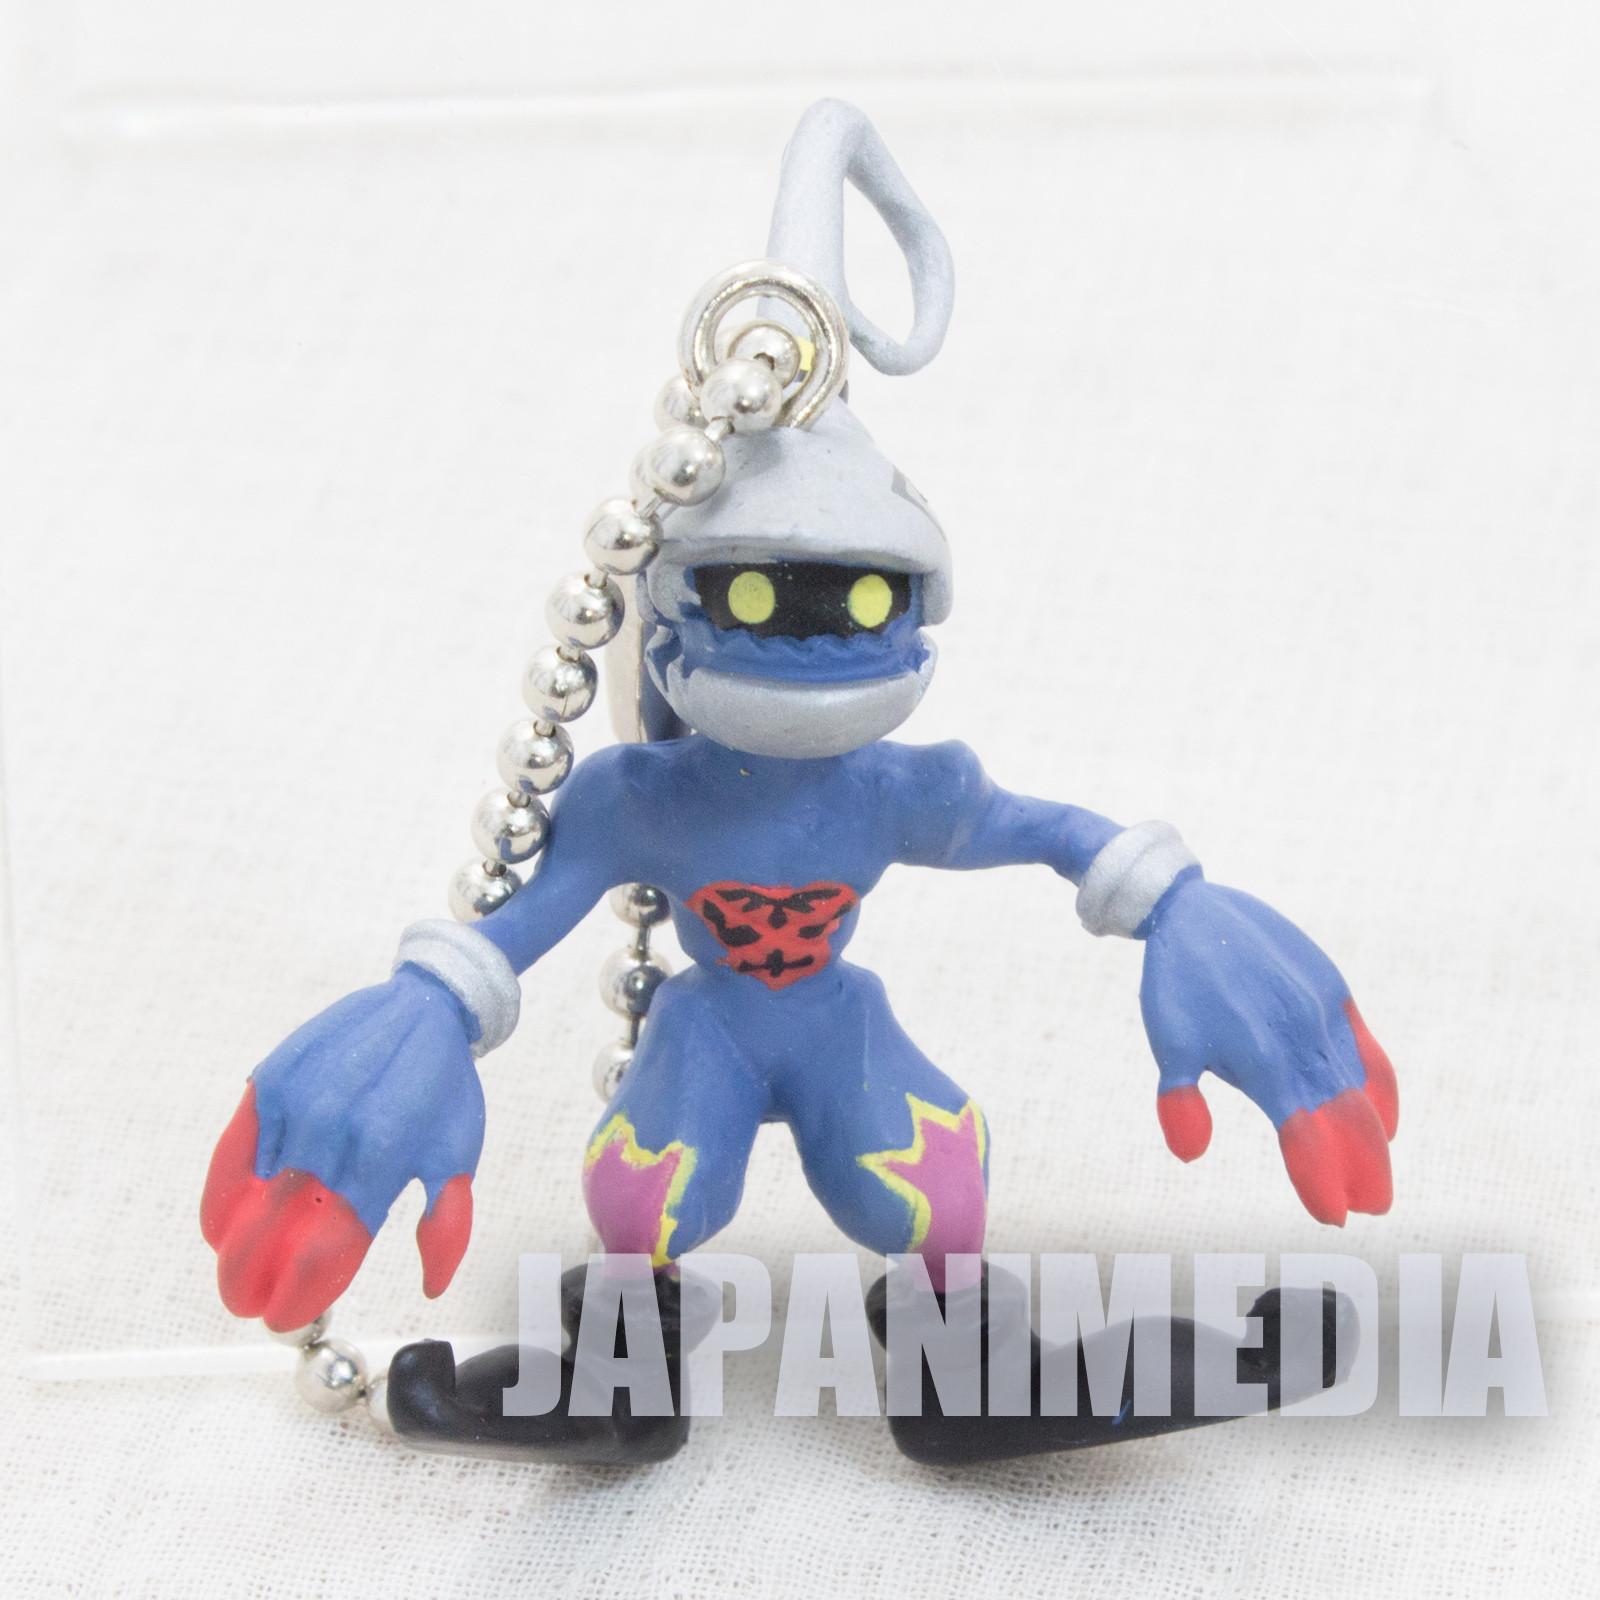 Kingdom Hearts SOLDIER Mini Figure Ballchain Square Enix JAPAN